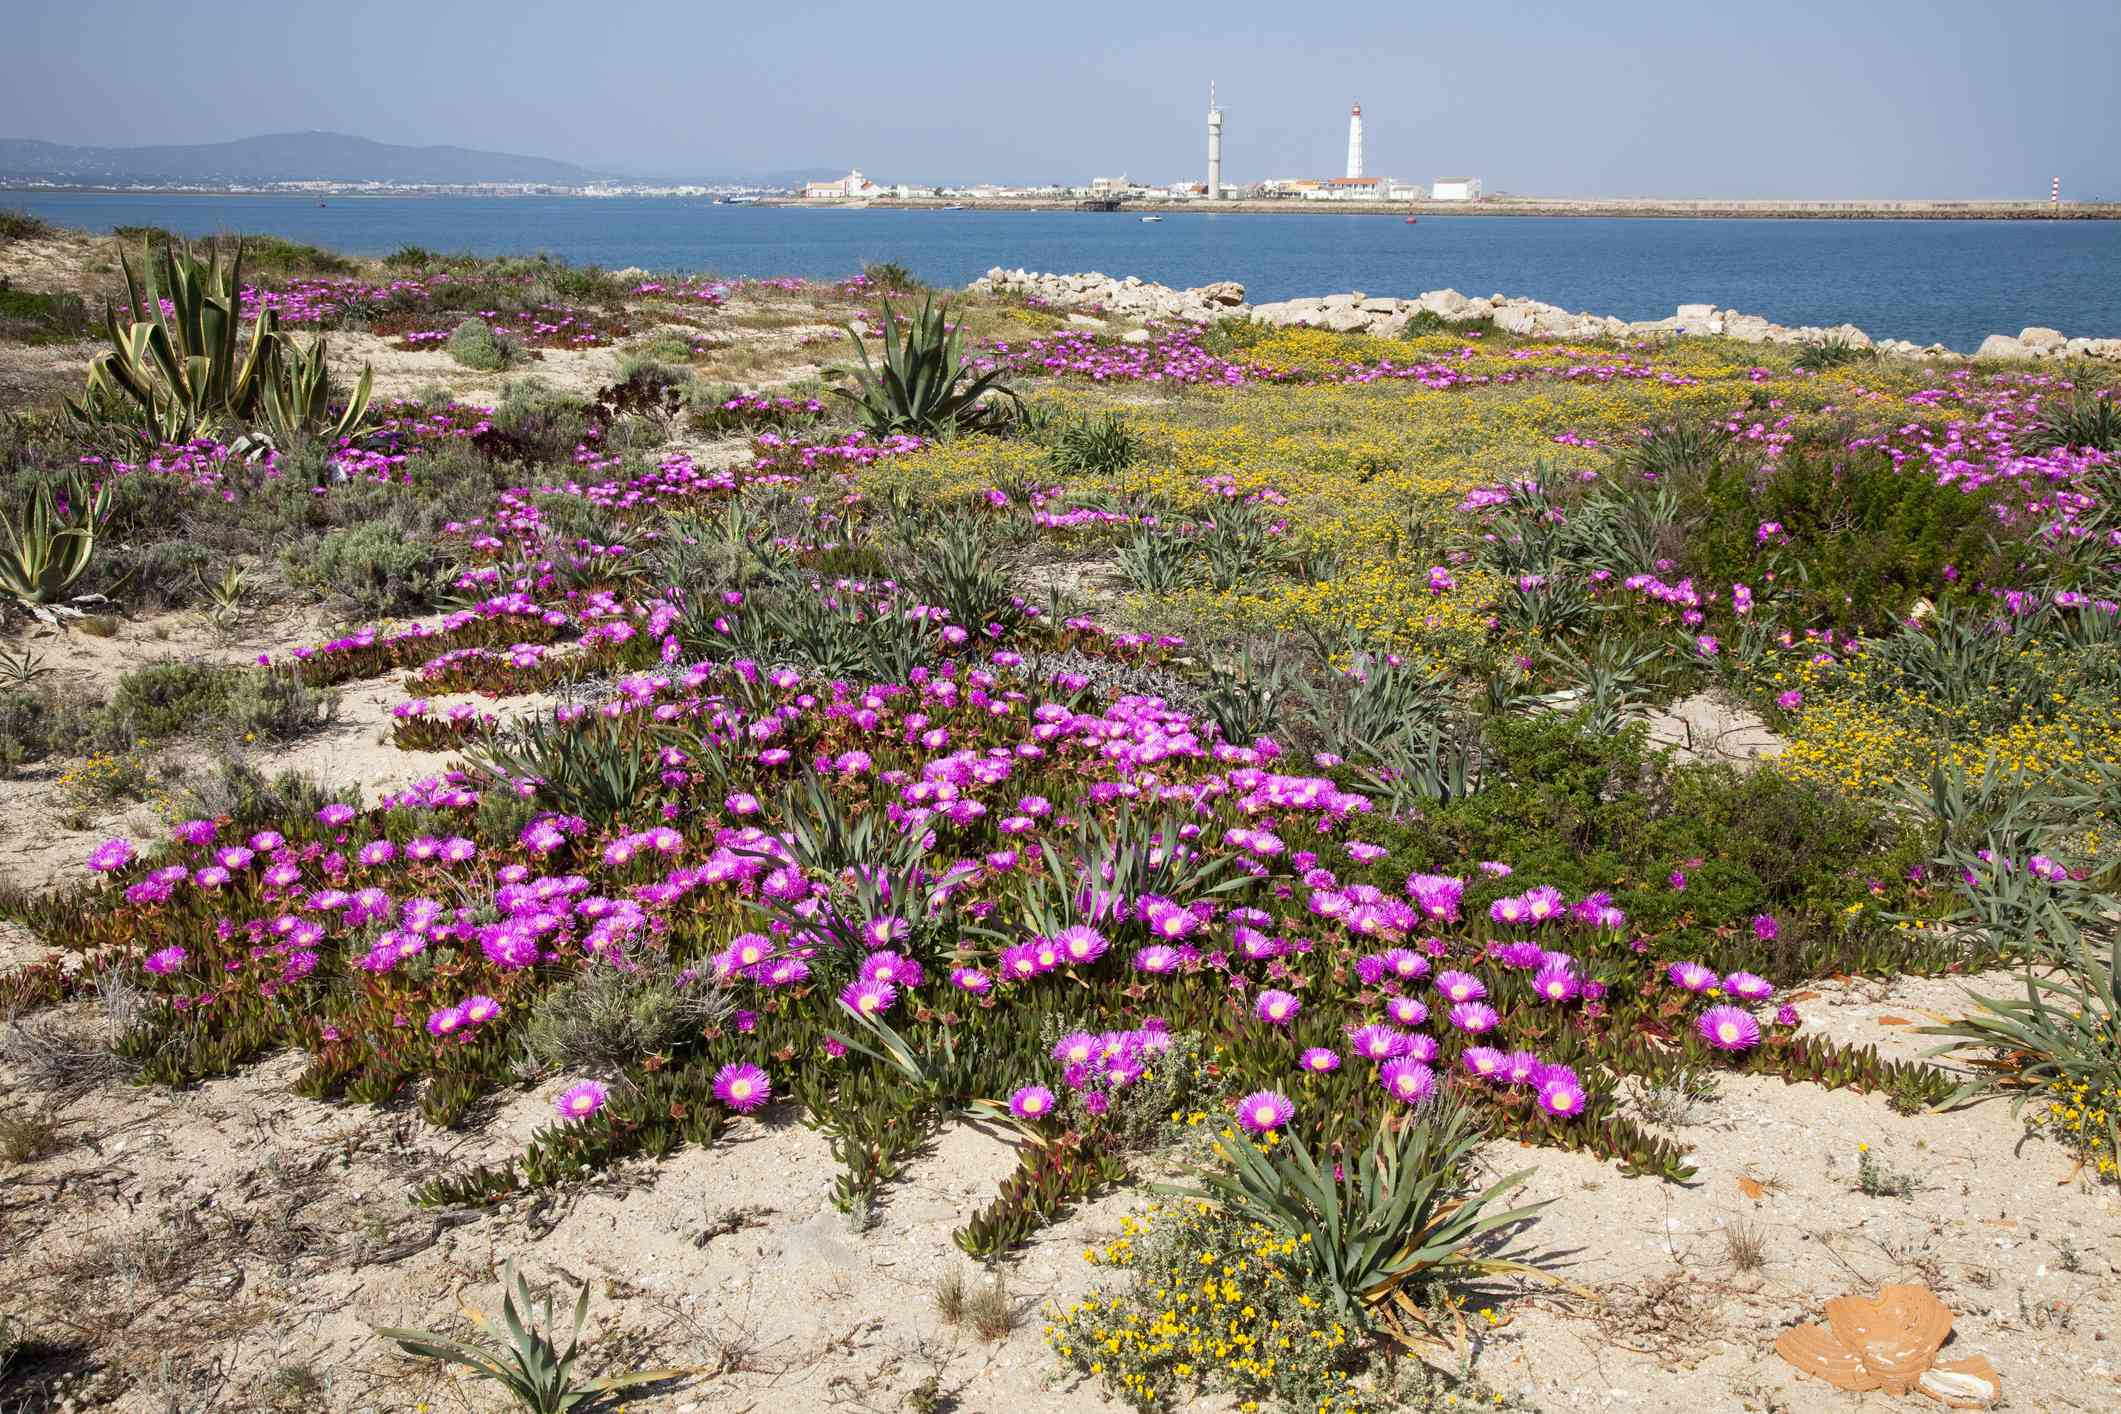 Barreta Island With Purple Flowers Growing On The Shore; Algarve Portugal